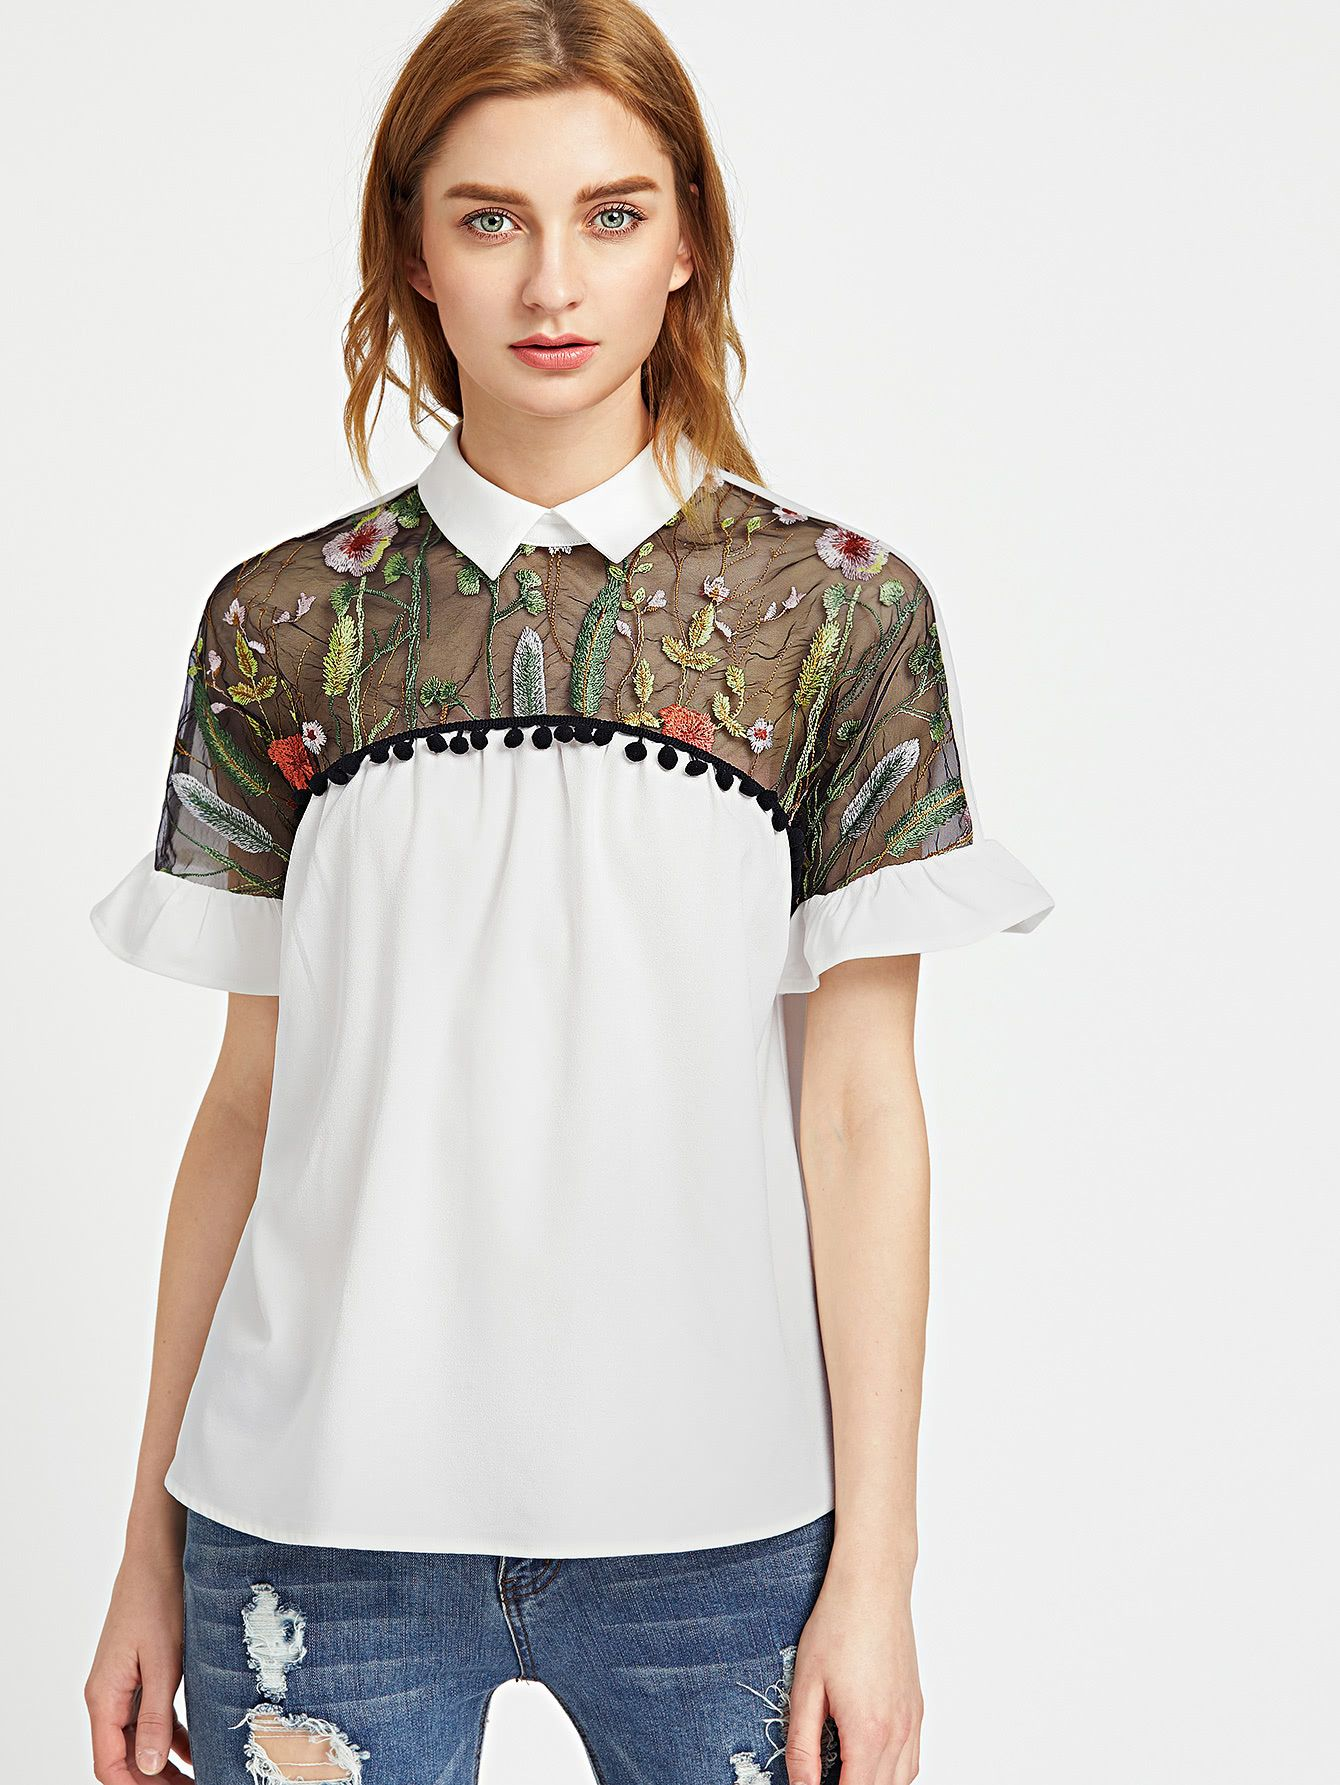 4b7e1fe1706 Shop Contrast Embroidered Mesh Yoke Ruffle Sleeve Top online. SheIn offers  Contrast Embroidered Mesh Yoke Ruffle Sleeve Top & more to fit your  fashionable ...